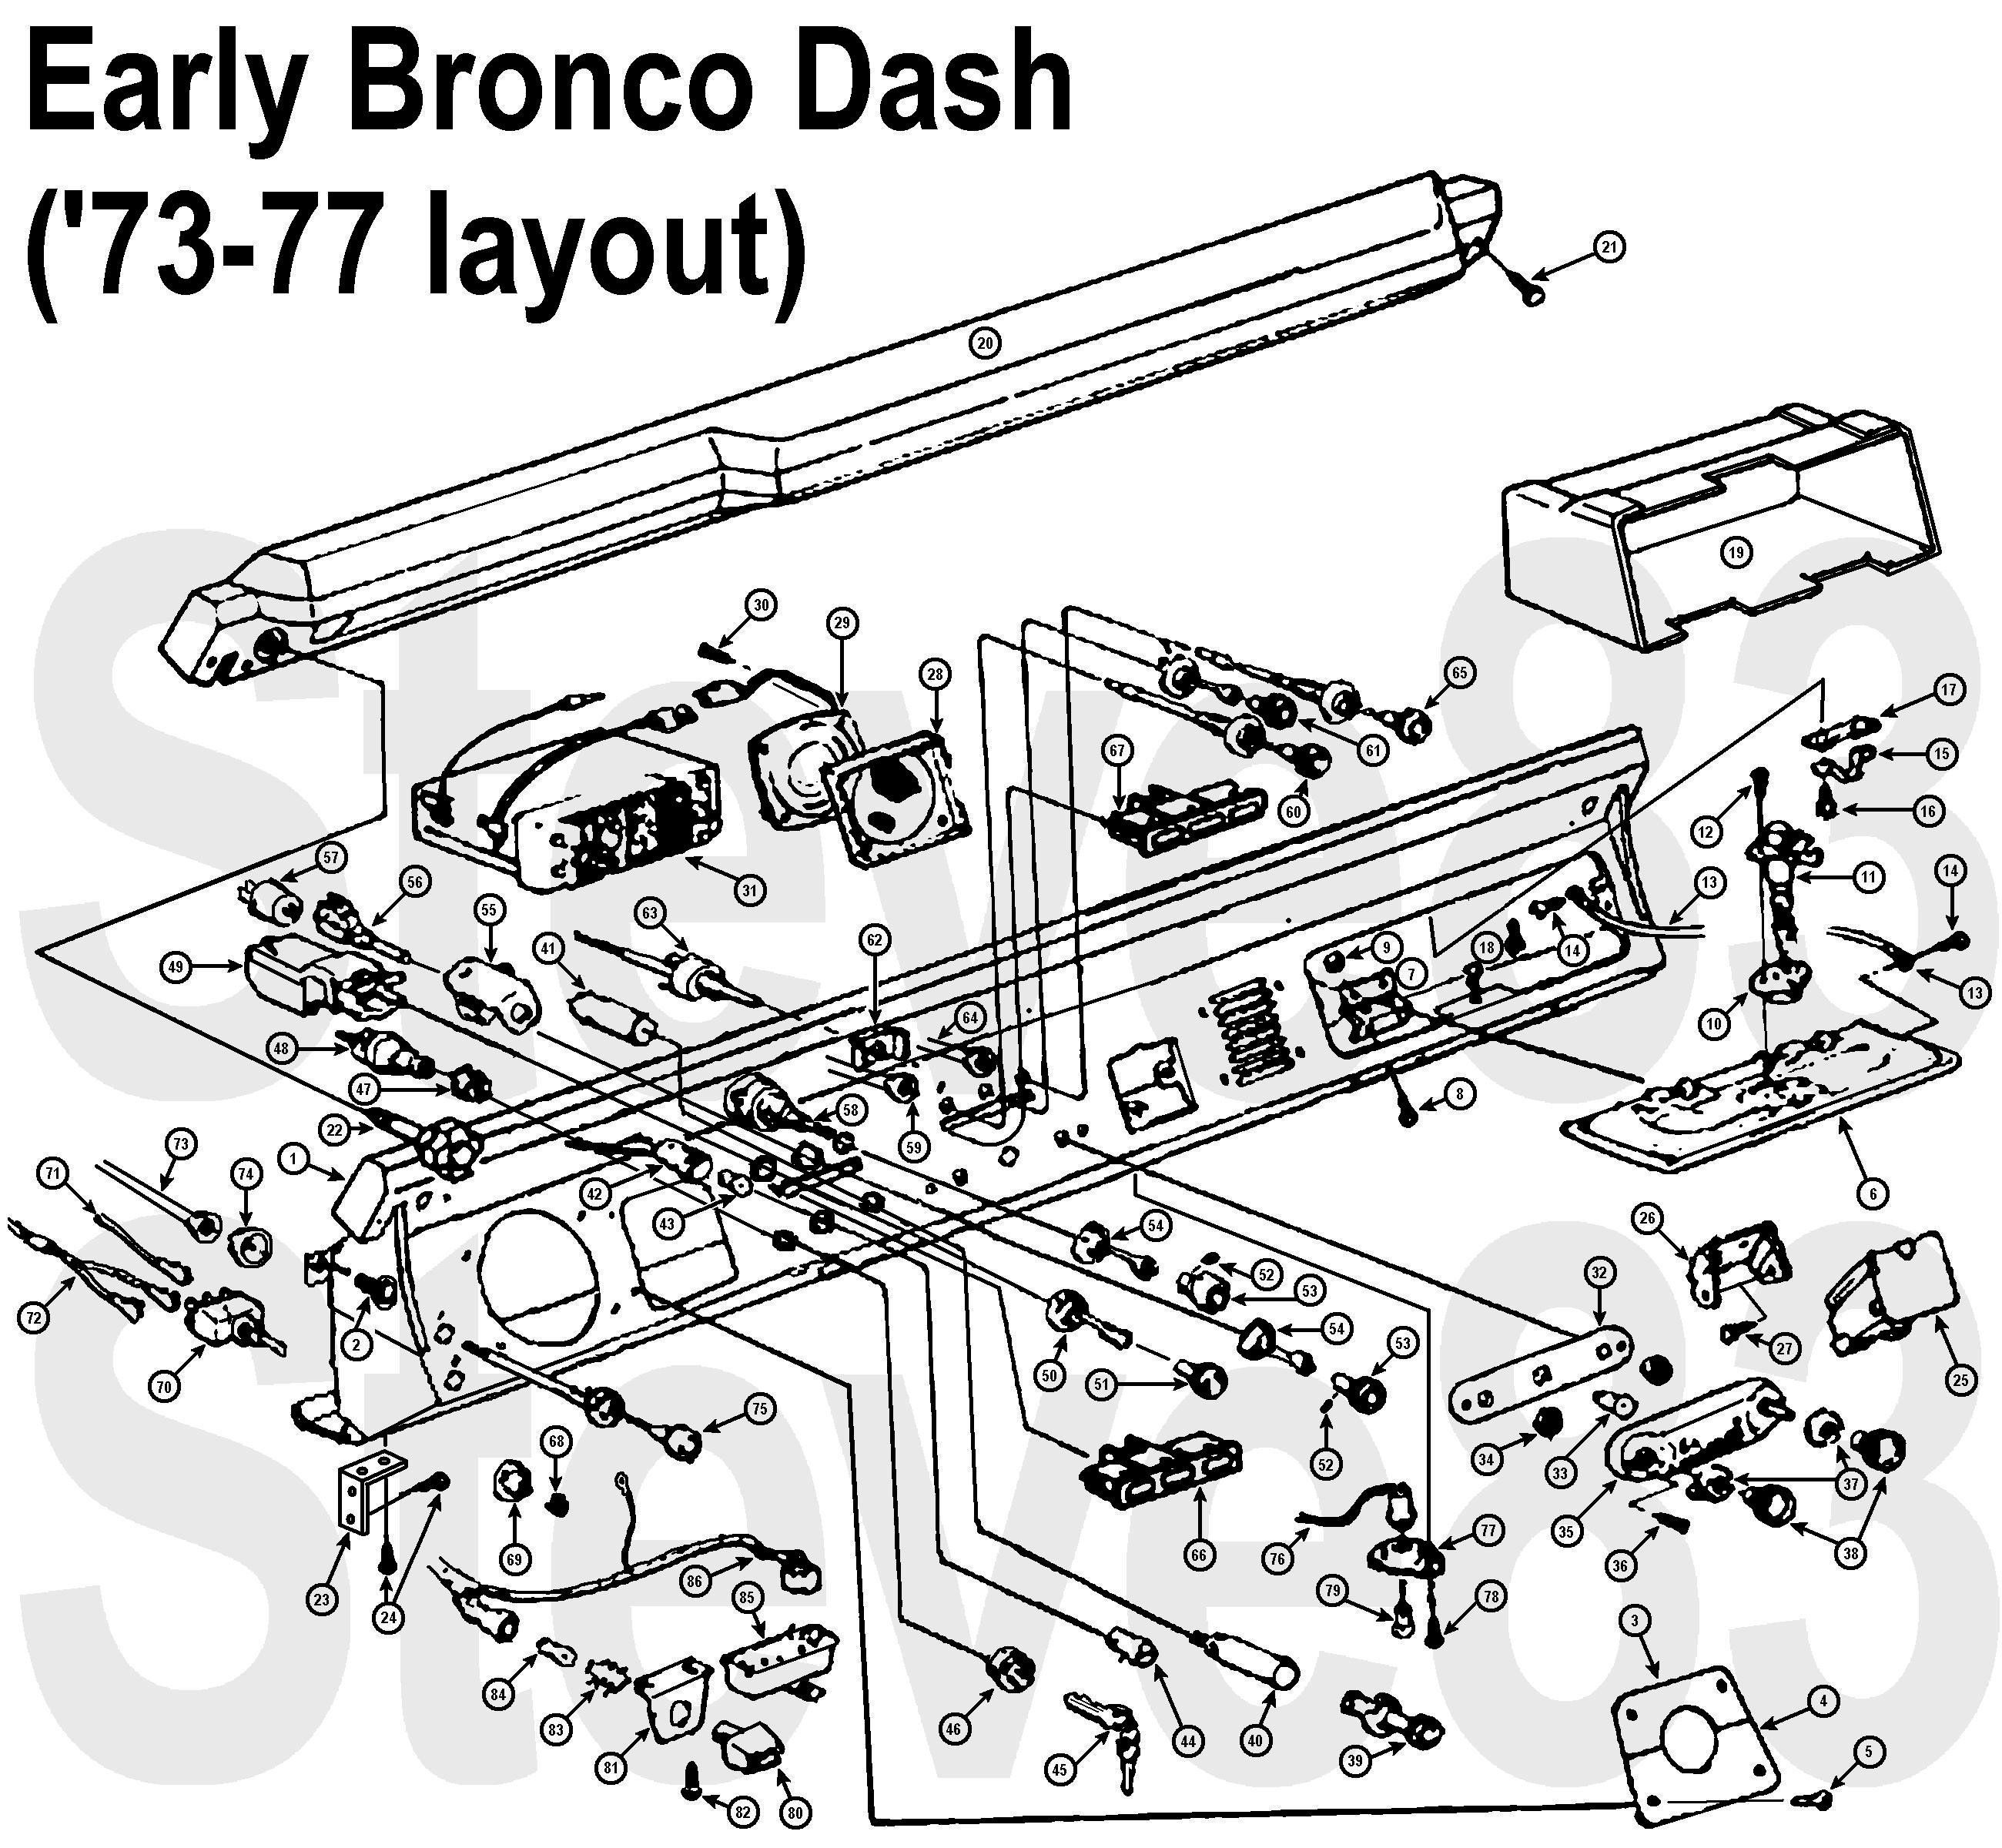 bronco dash diagram electrical diagrams forum u2022 rh jimmellon co uk